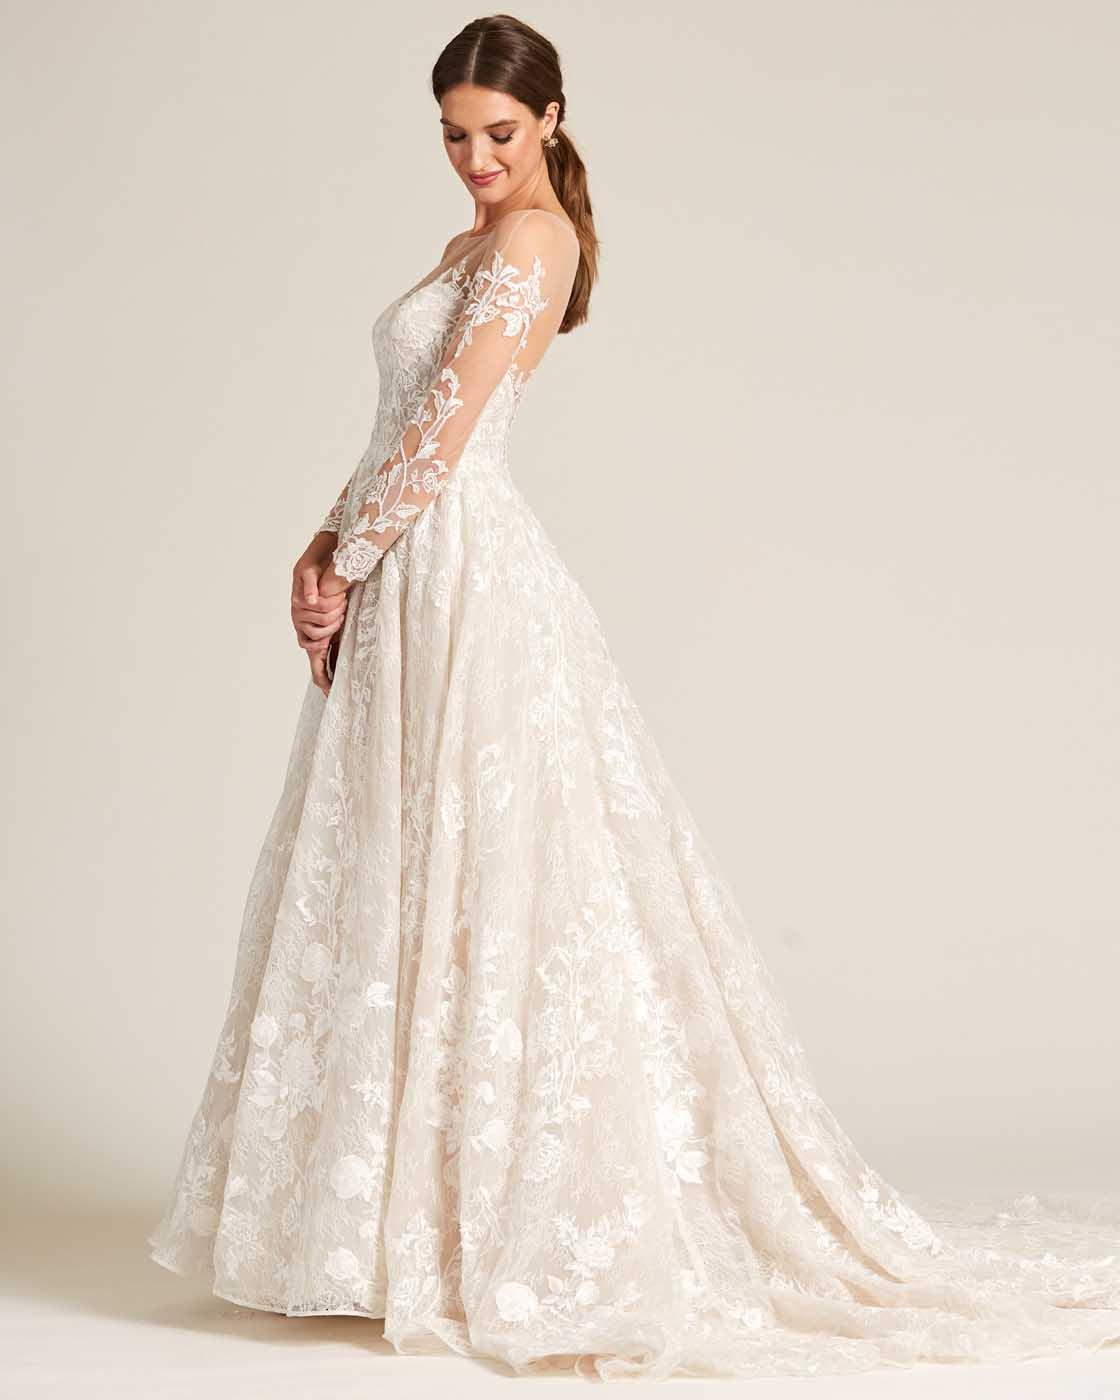 White Illusion Neckline Embroidered Sleeves Wedding Dress - Side